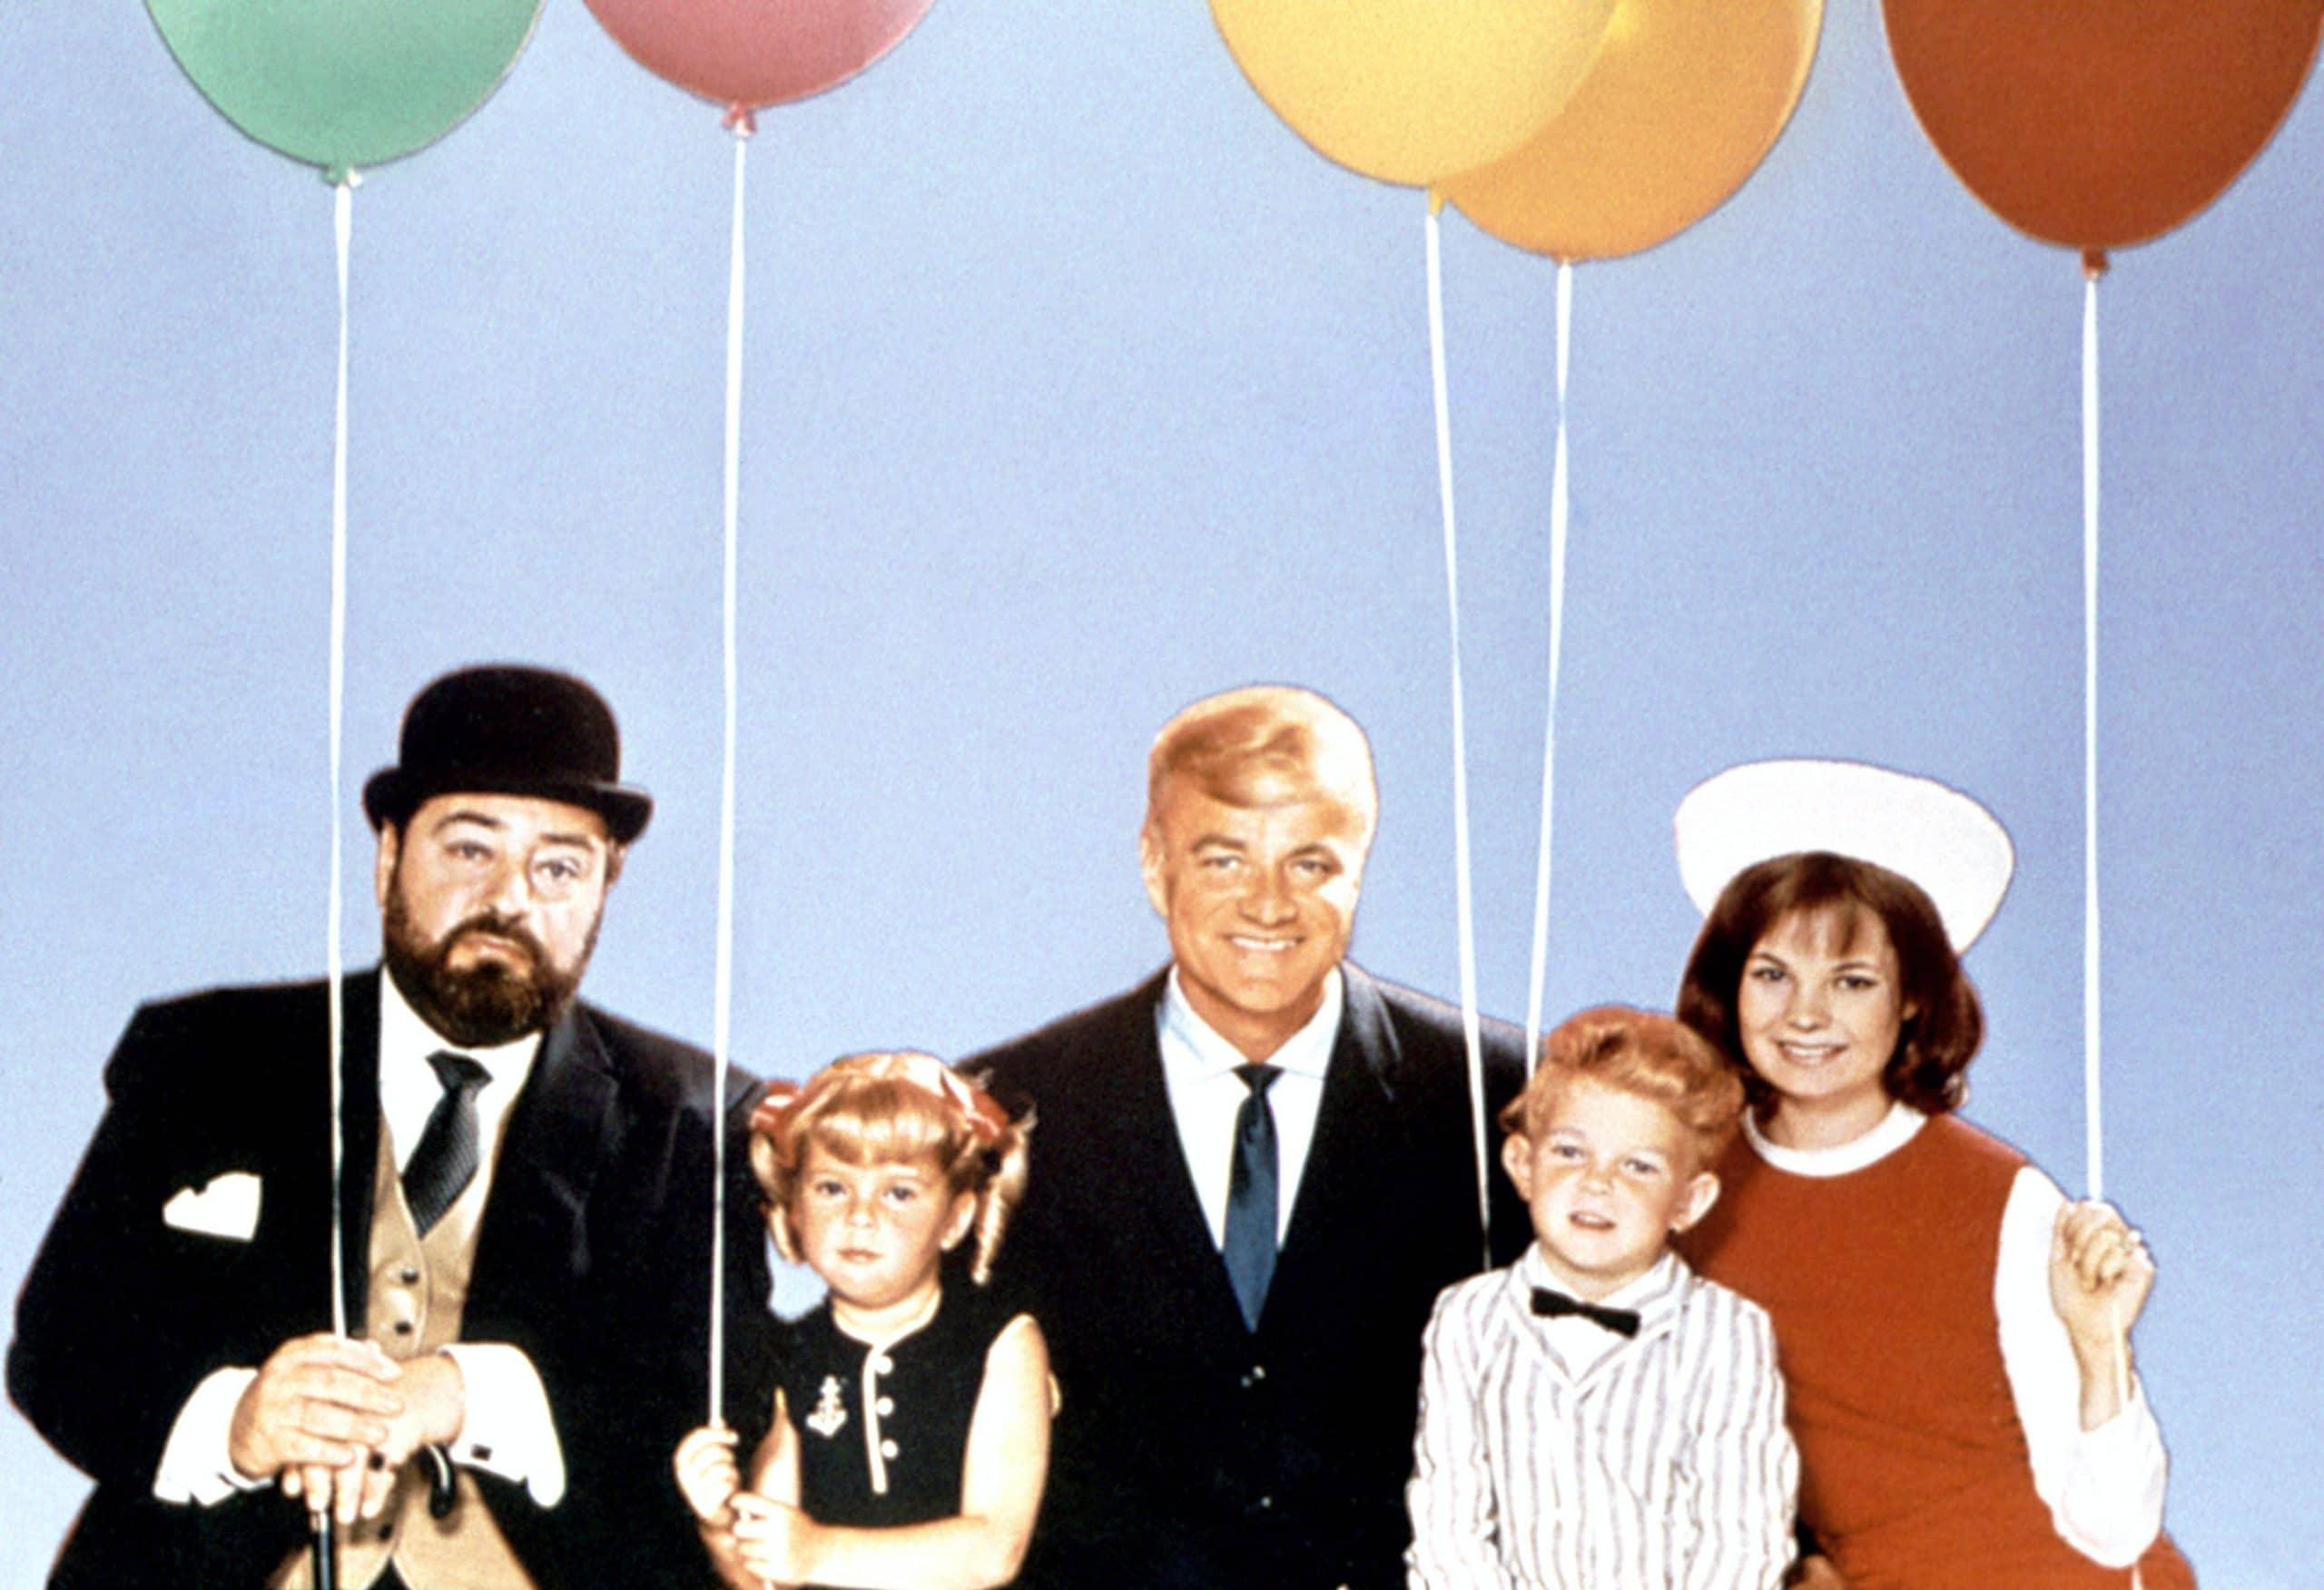 FAMILY AFFAIR, Sebastian Cabot, Anissa Jones, Brian Keith, Johnny Whitaker, Kathy Garver, 1966-71